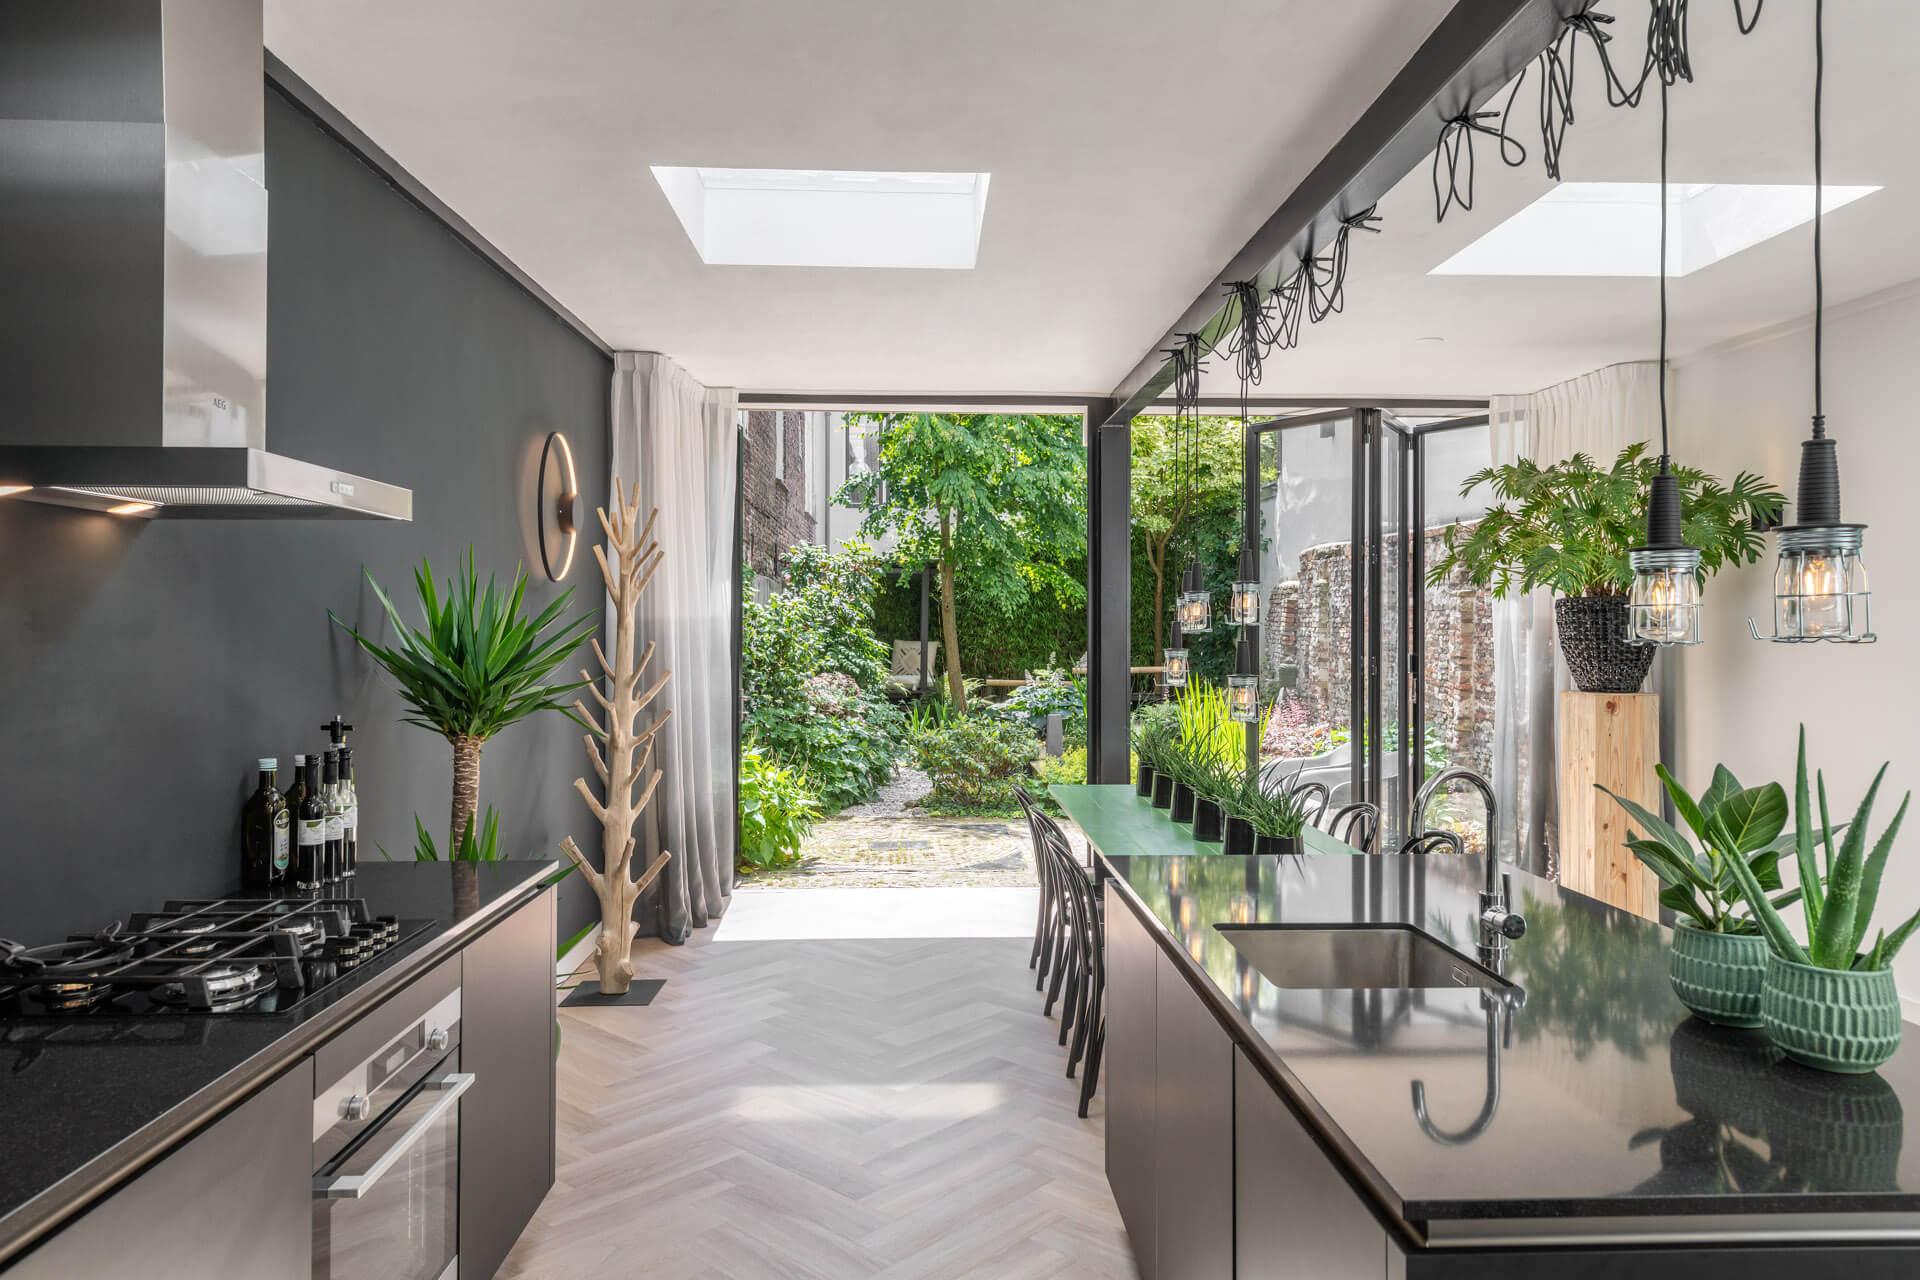 Solarlux Ecoline bi-folding door